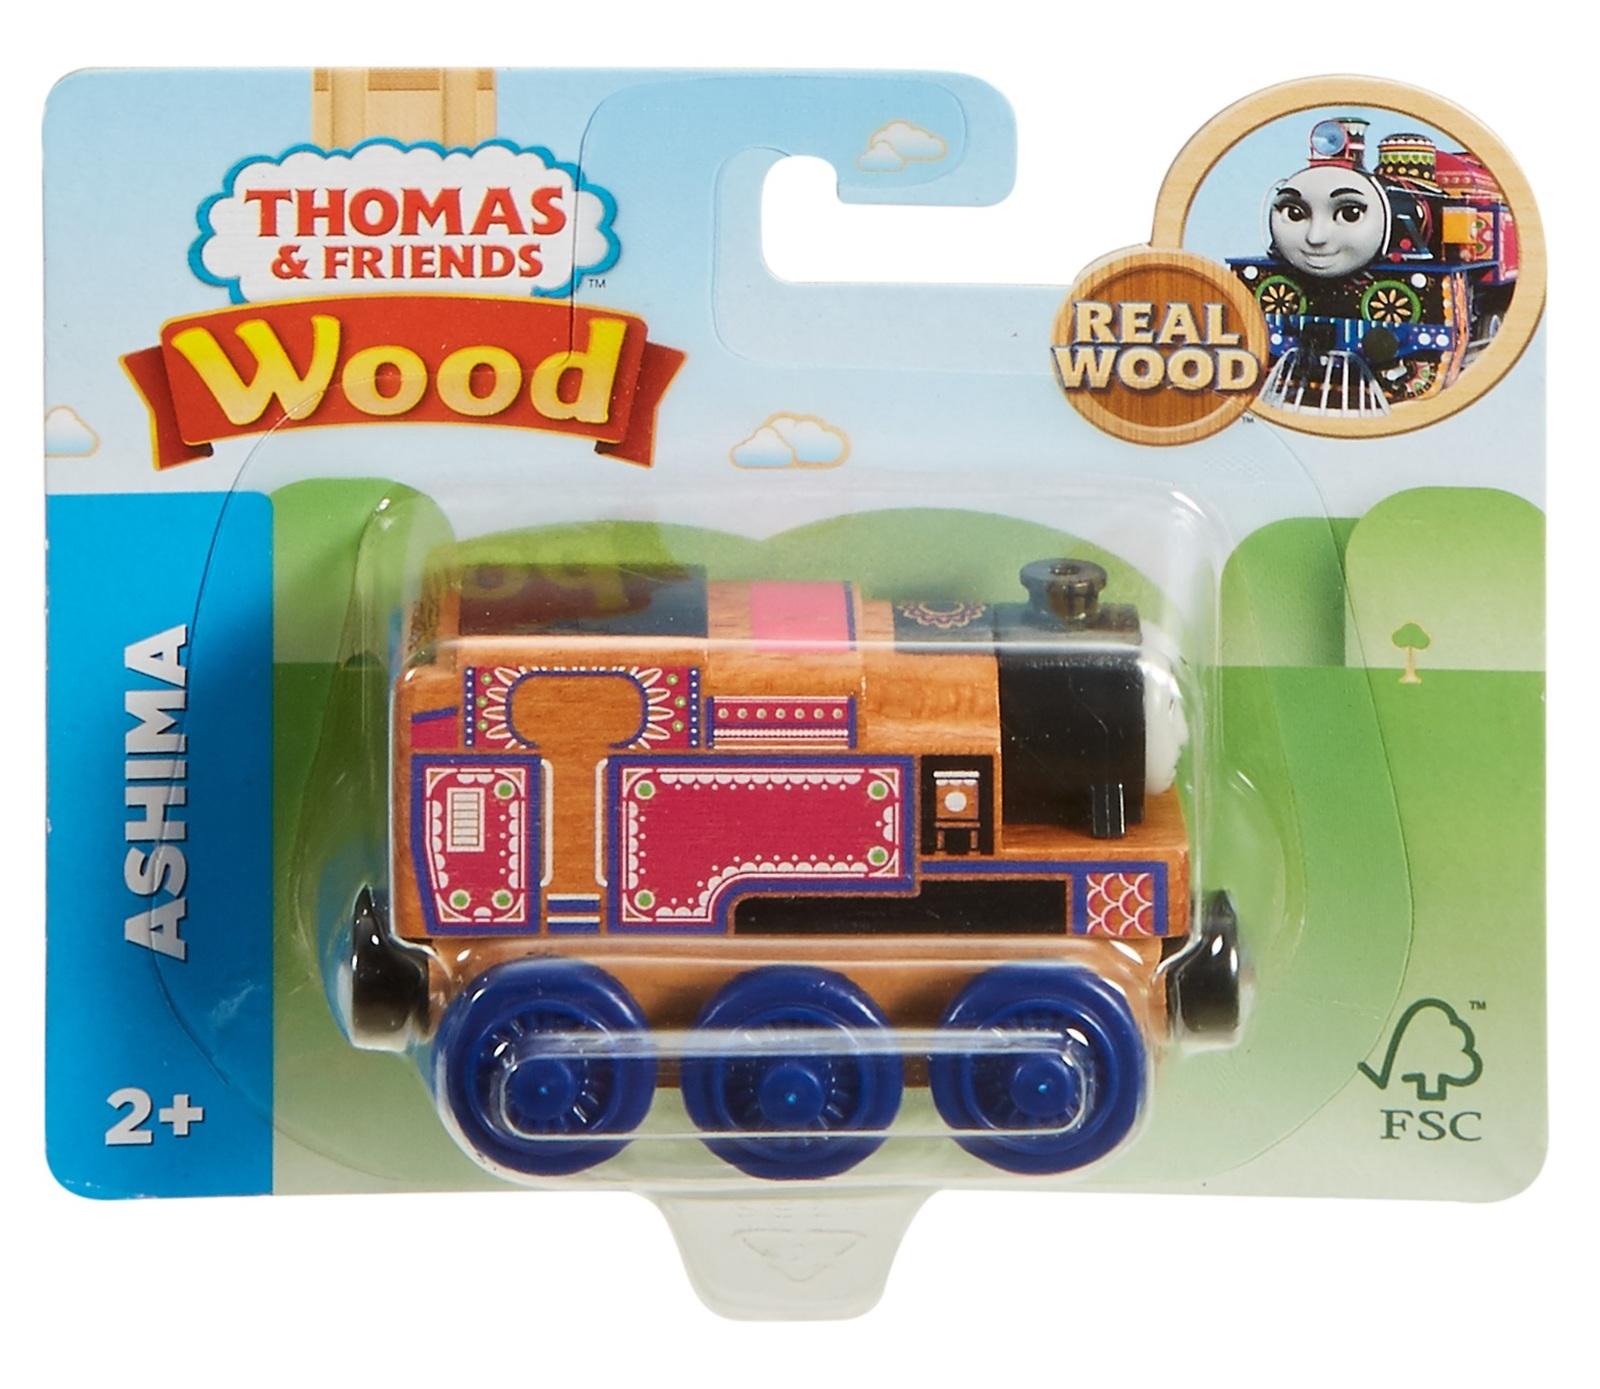 Thomas & Friends: Wooden Railway - Ashima image